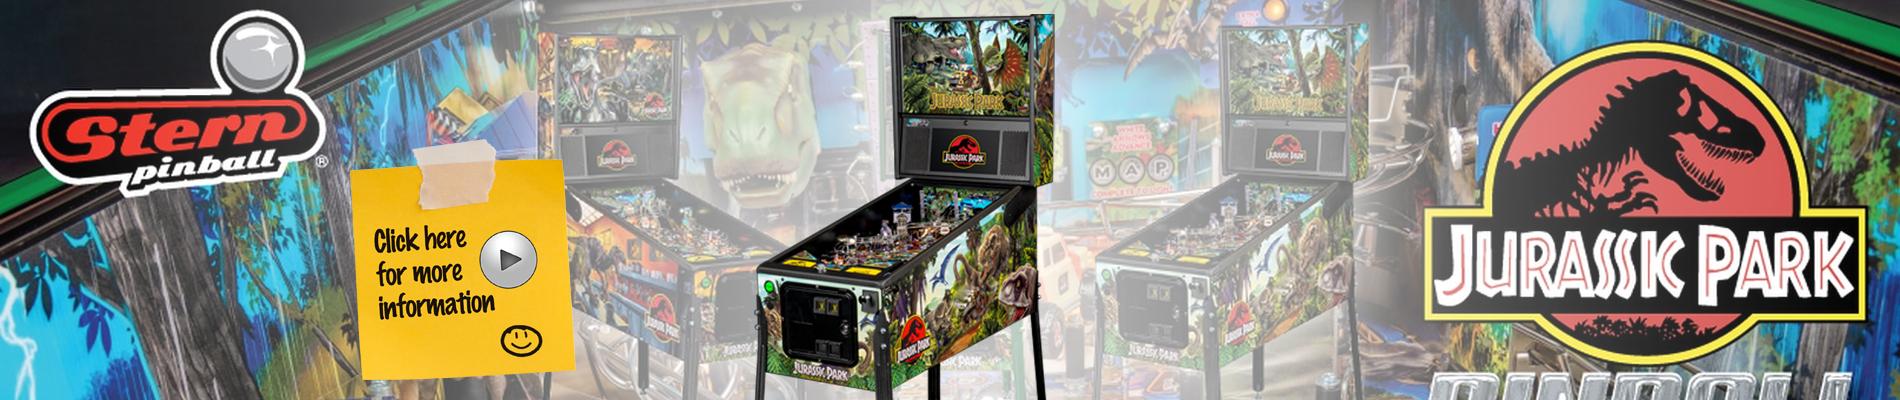 Jurassic Park Pinball by Stern Pinball